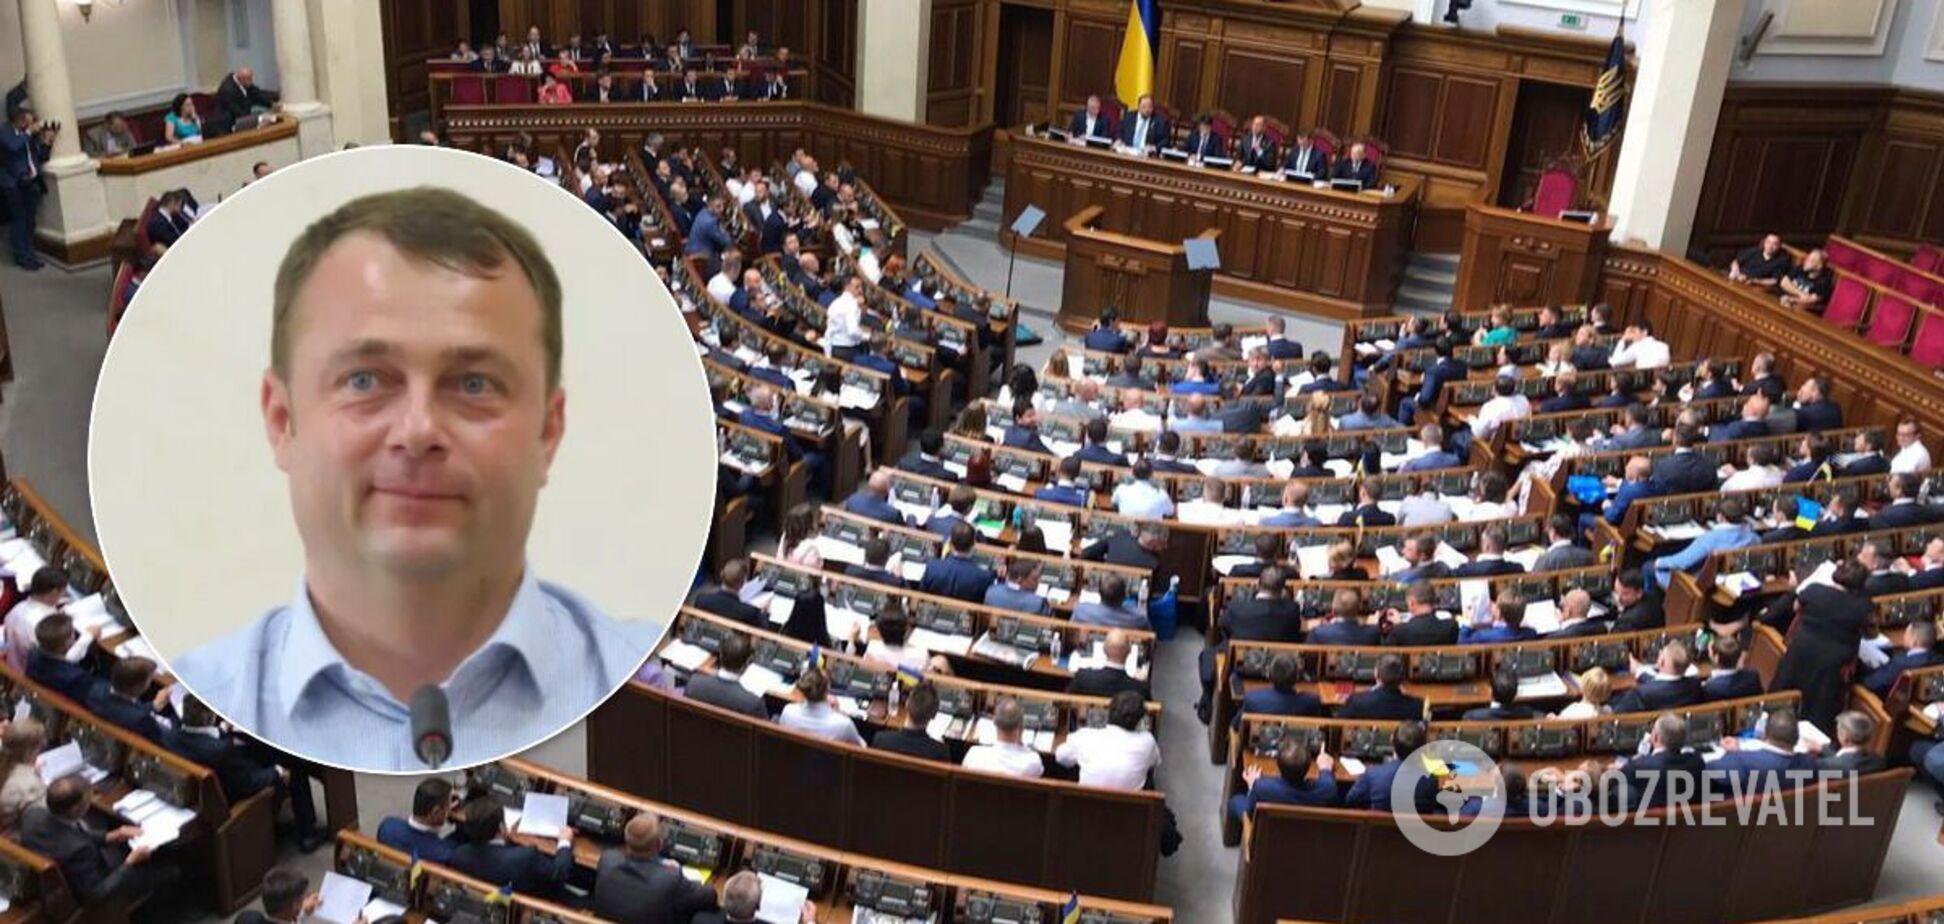 Рада прекратила полномочия скандального нардепа Требушкина